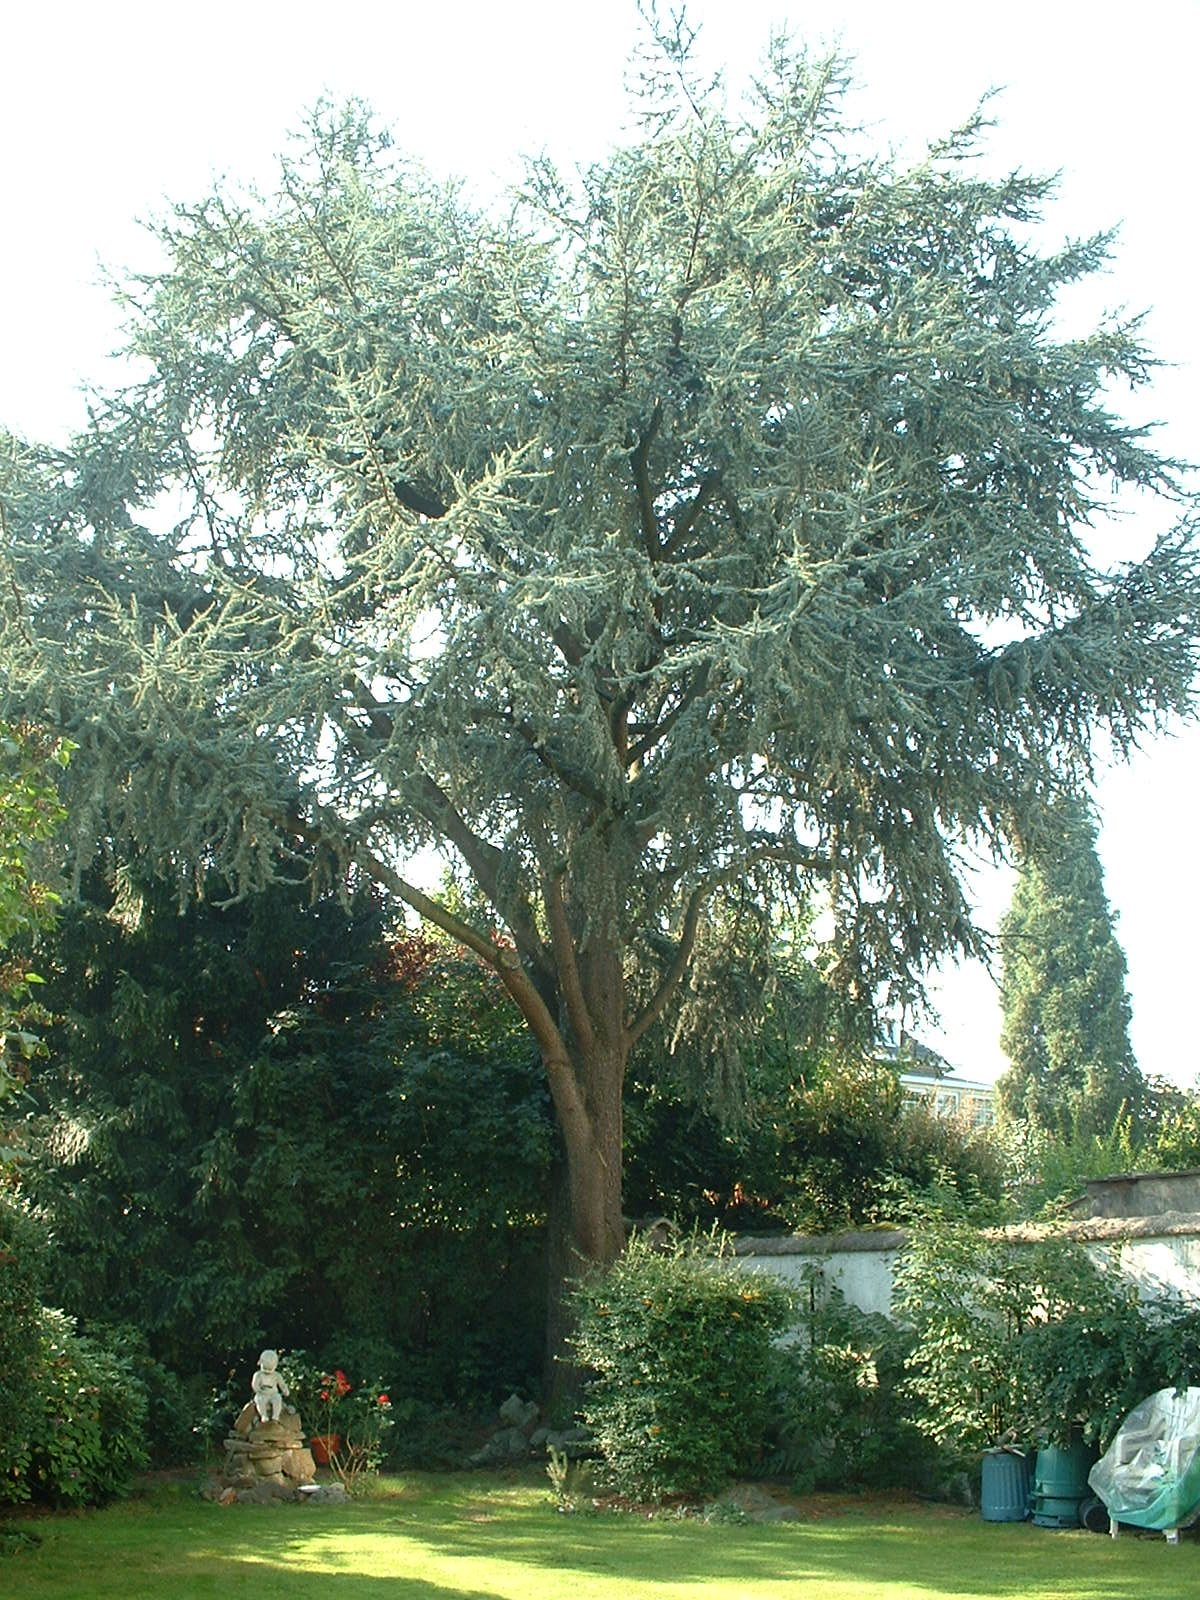 Blauwe ceder – St.- Agatha - Berchem, René Comhairelaan, 115 –  08 September 2003